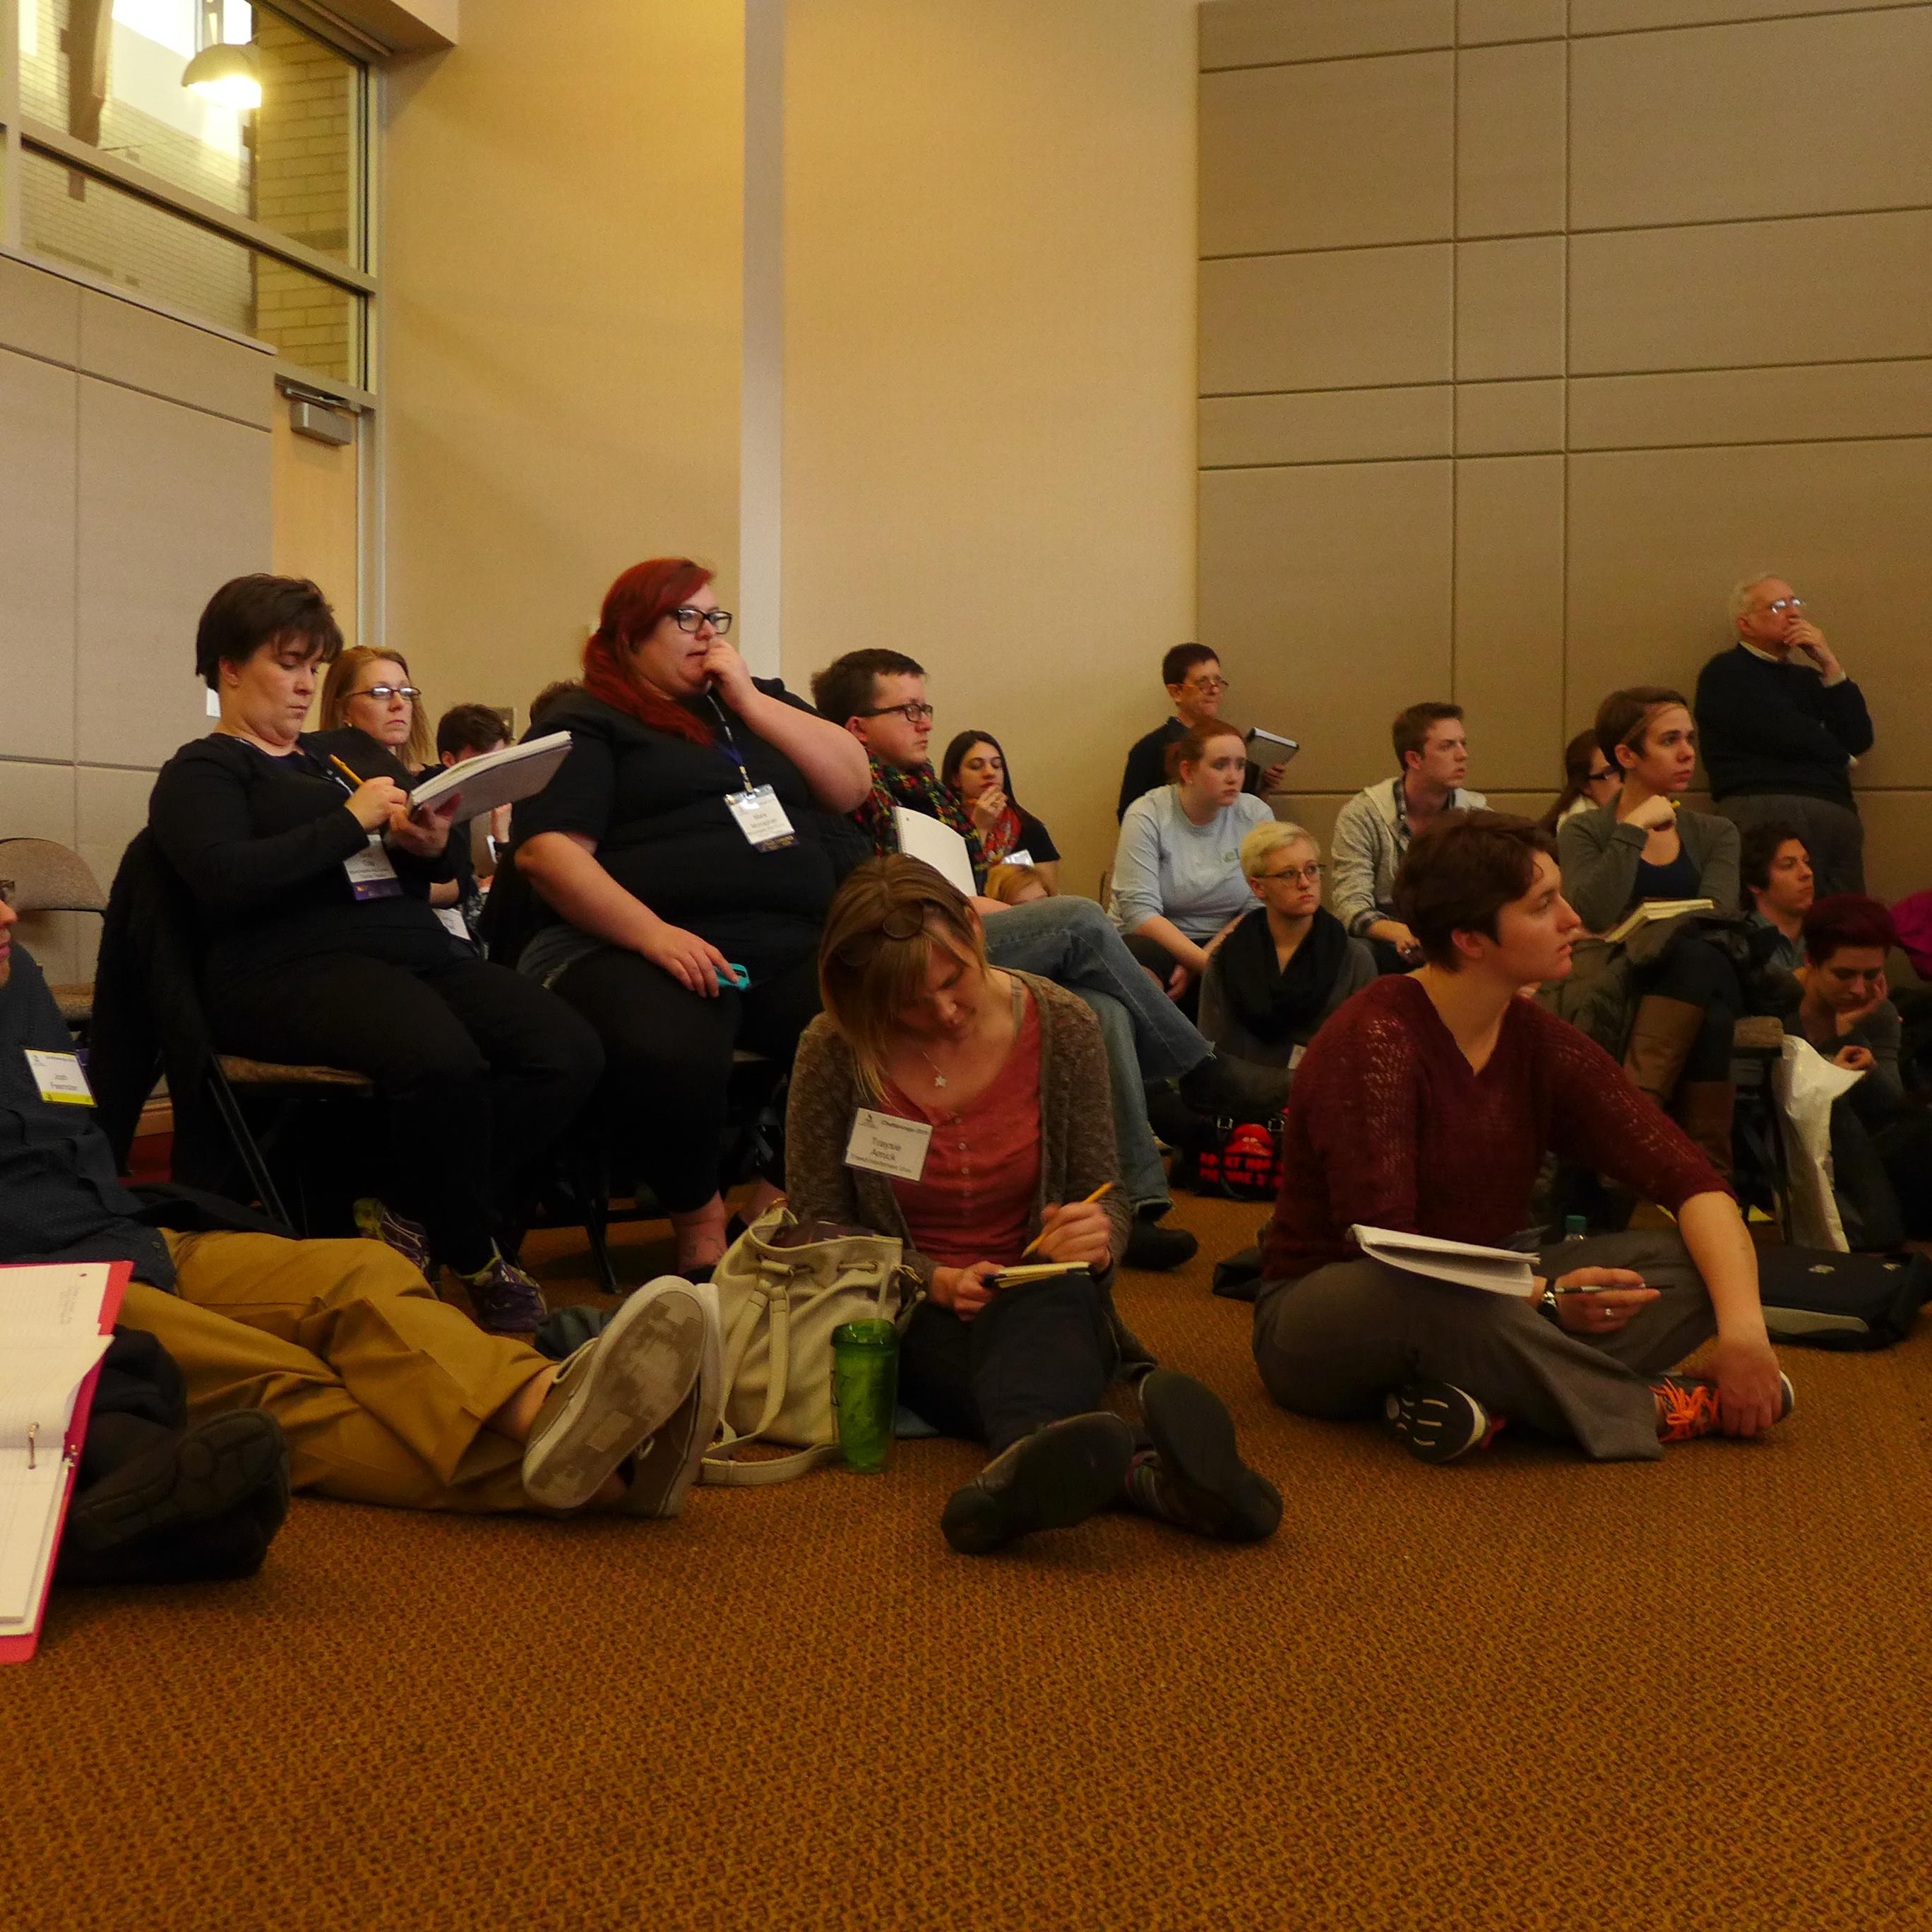 Michael Chekhov Master Teacher Lisa Dalton explains SynthAnalysis at SETC as the class watches.